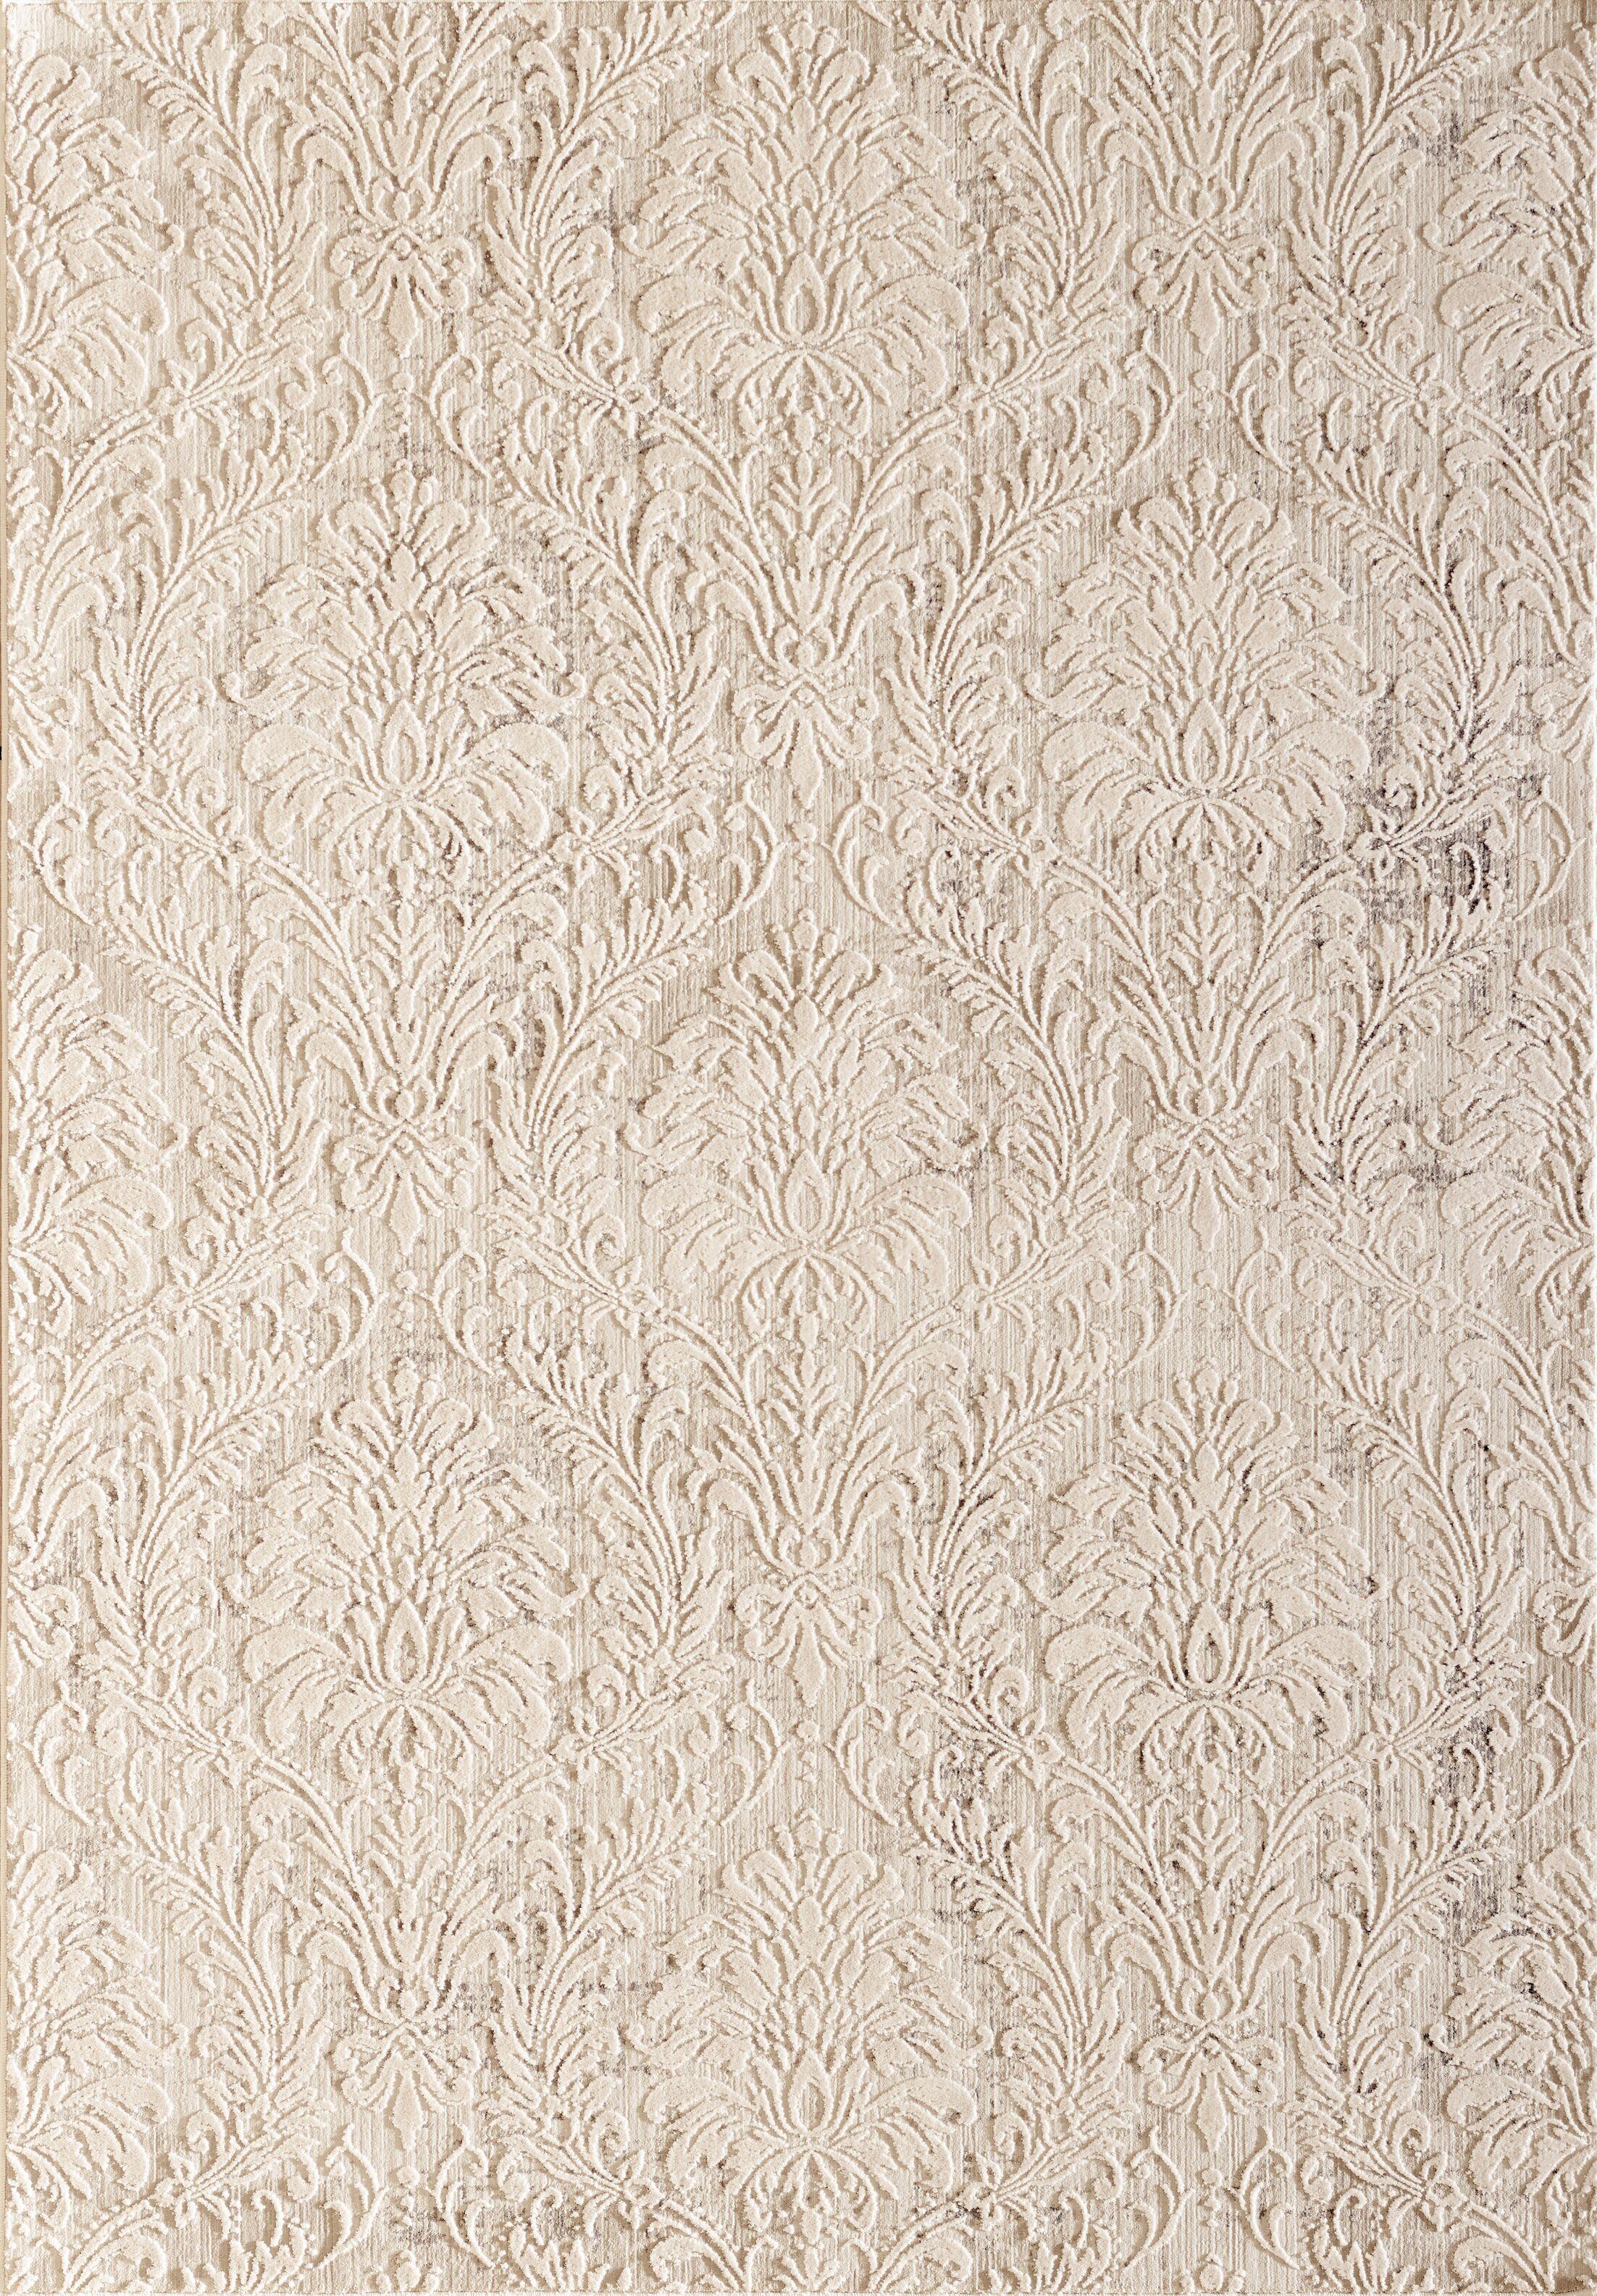 Caddie Ivory/Beige Area Rug Rug Size: Rectangle 5'3